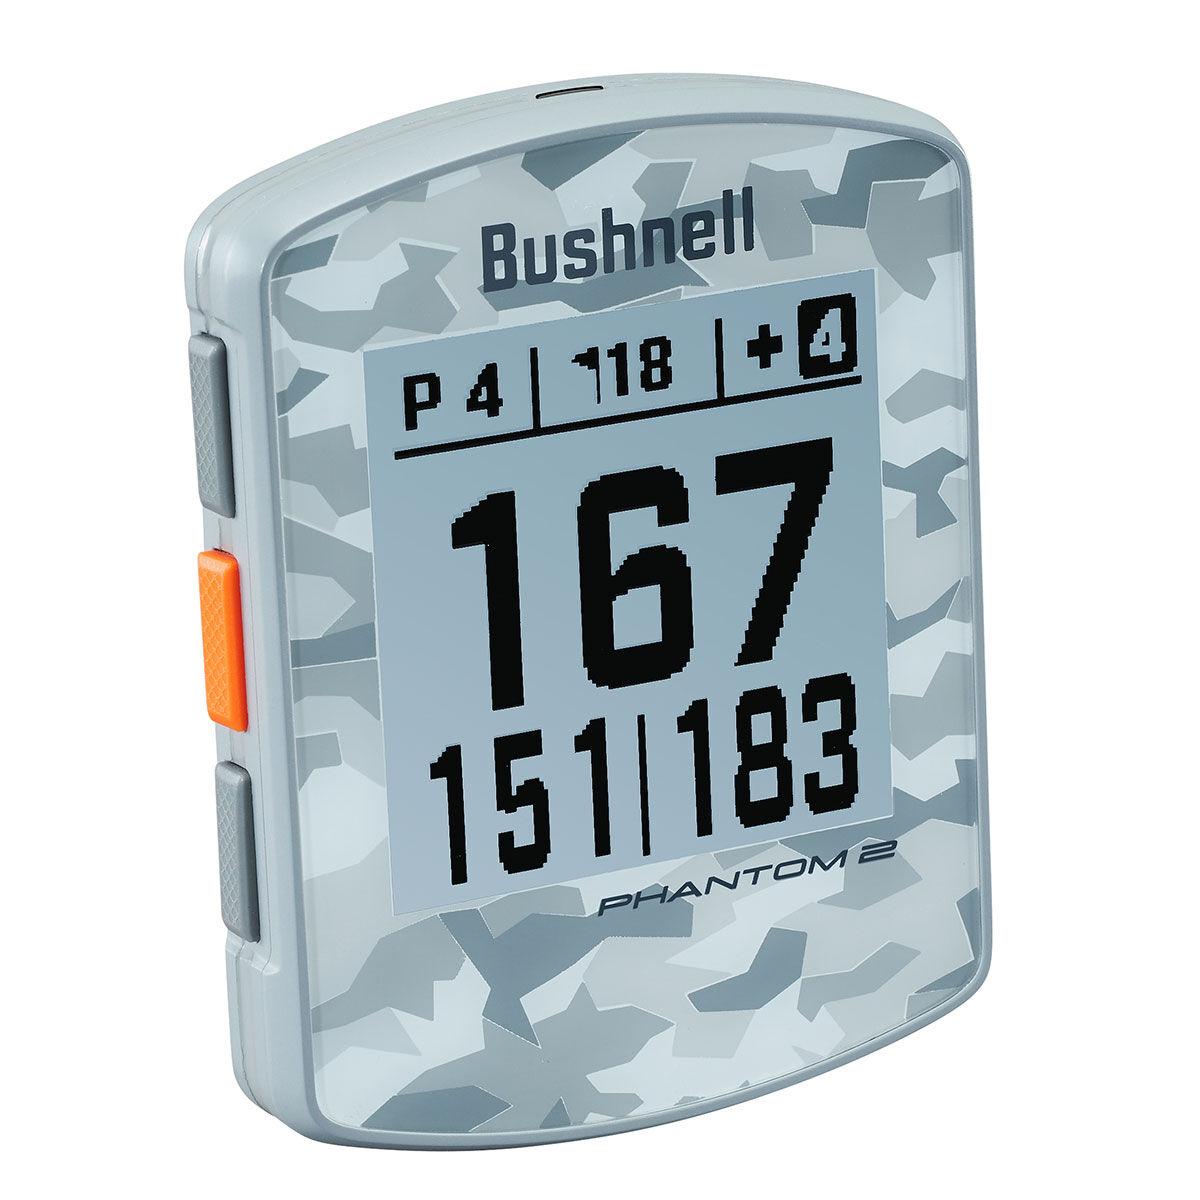 Bushnell Phantom 2 Handheld Golf GPS, Mens, Grey camo, One Size | American Golf